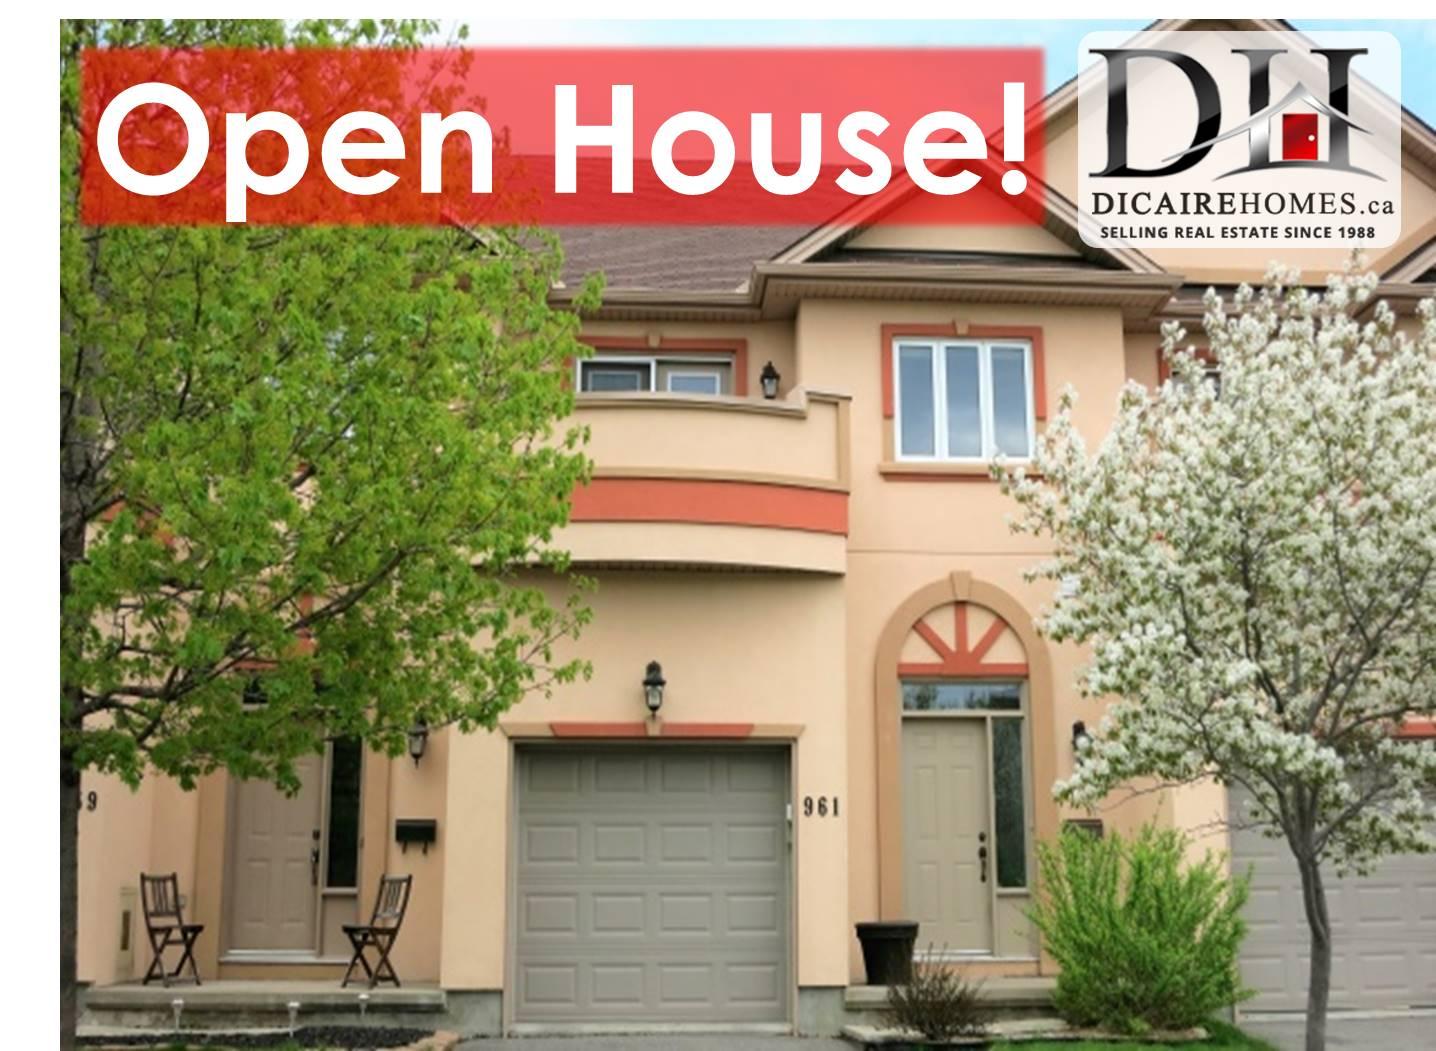 OPEN HOUSE 961 Gosnell Terrace.jpg